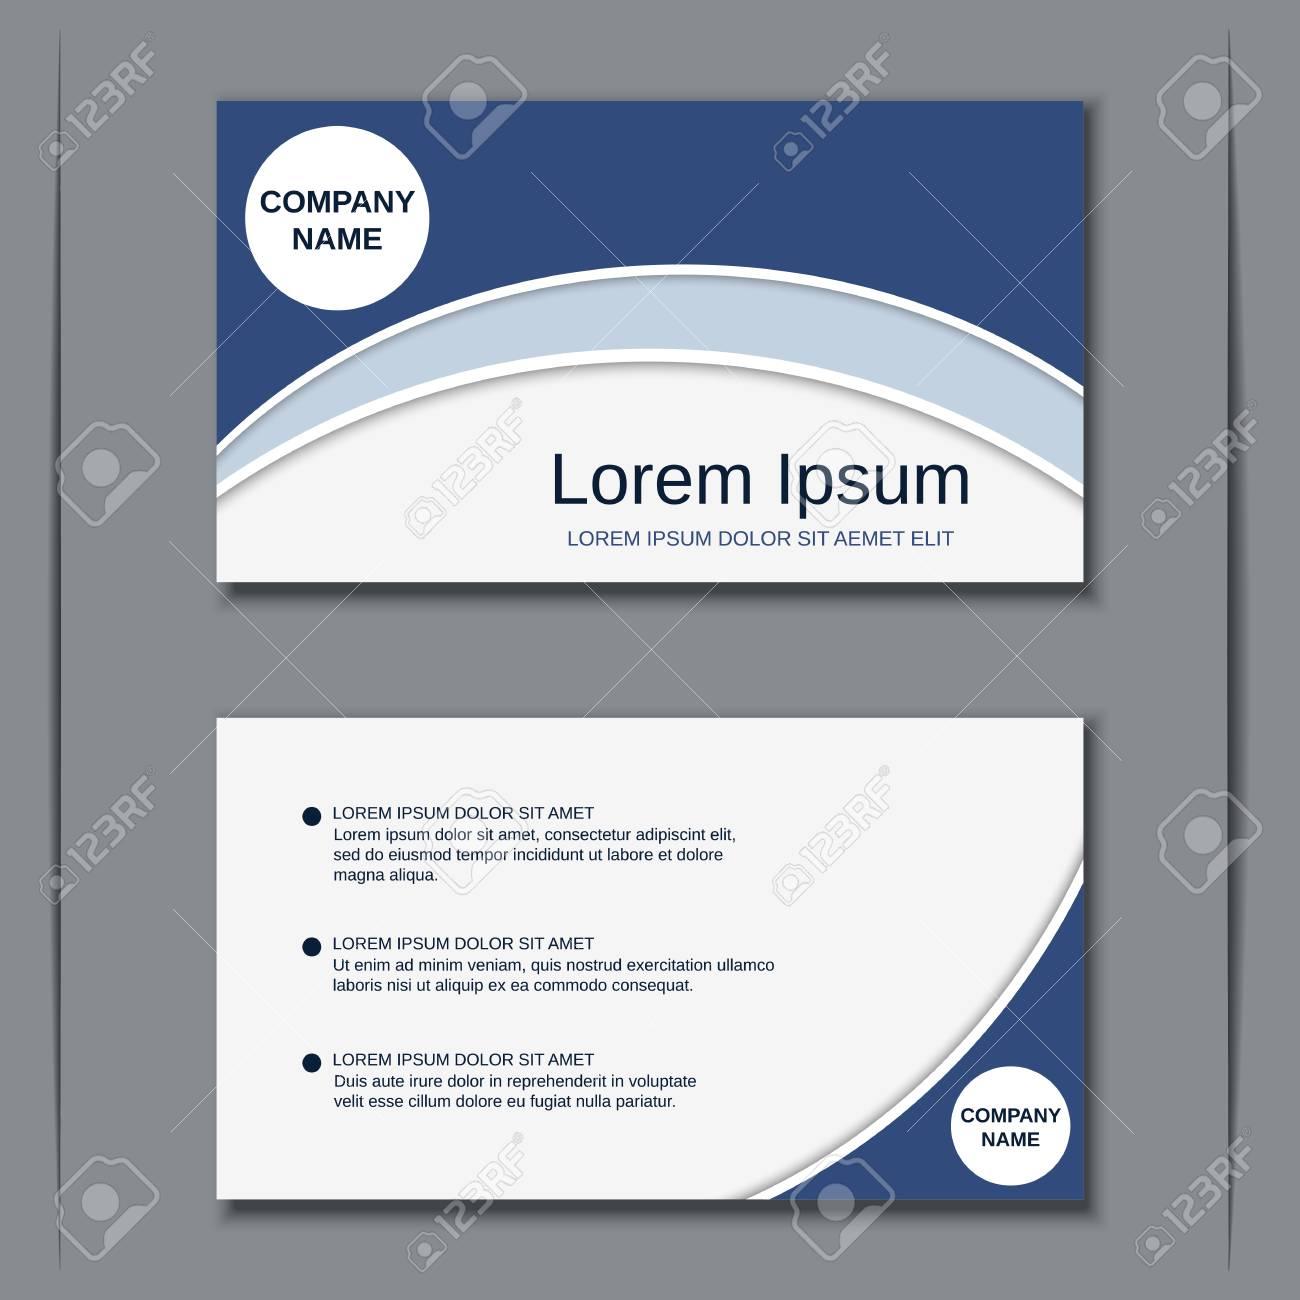 Business visiting card vector design templat - 96813359